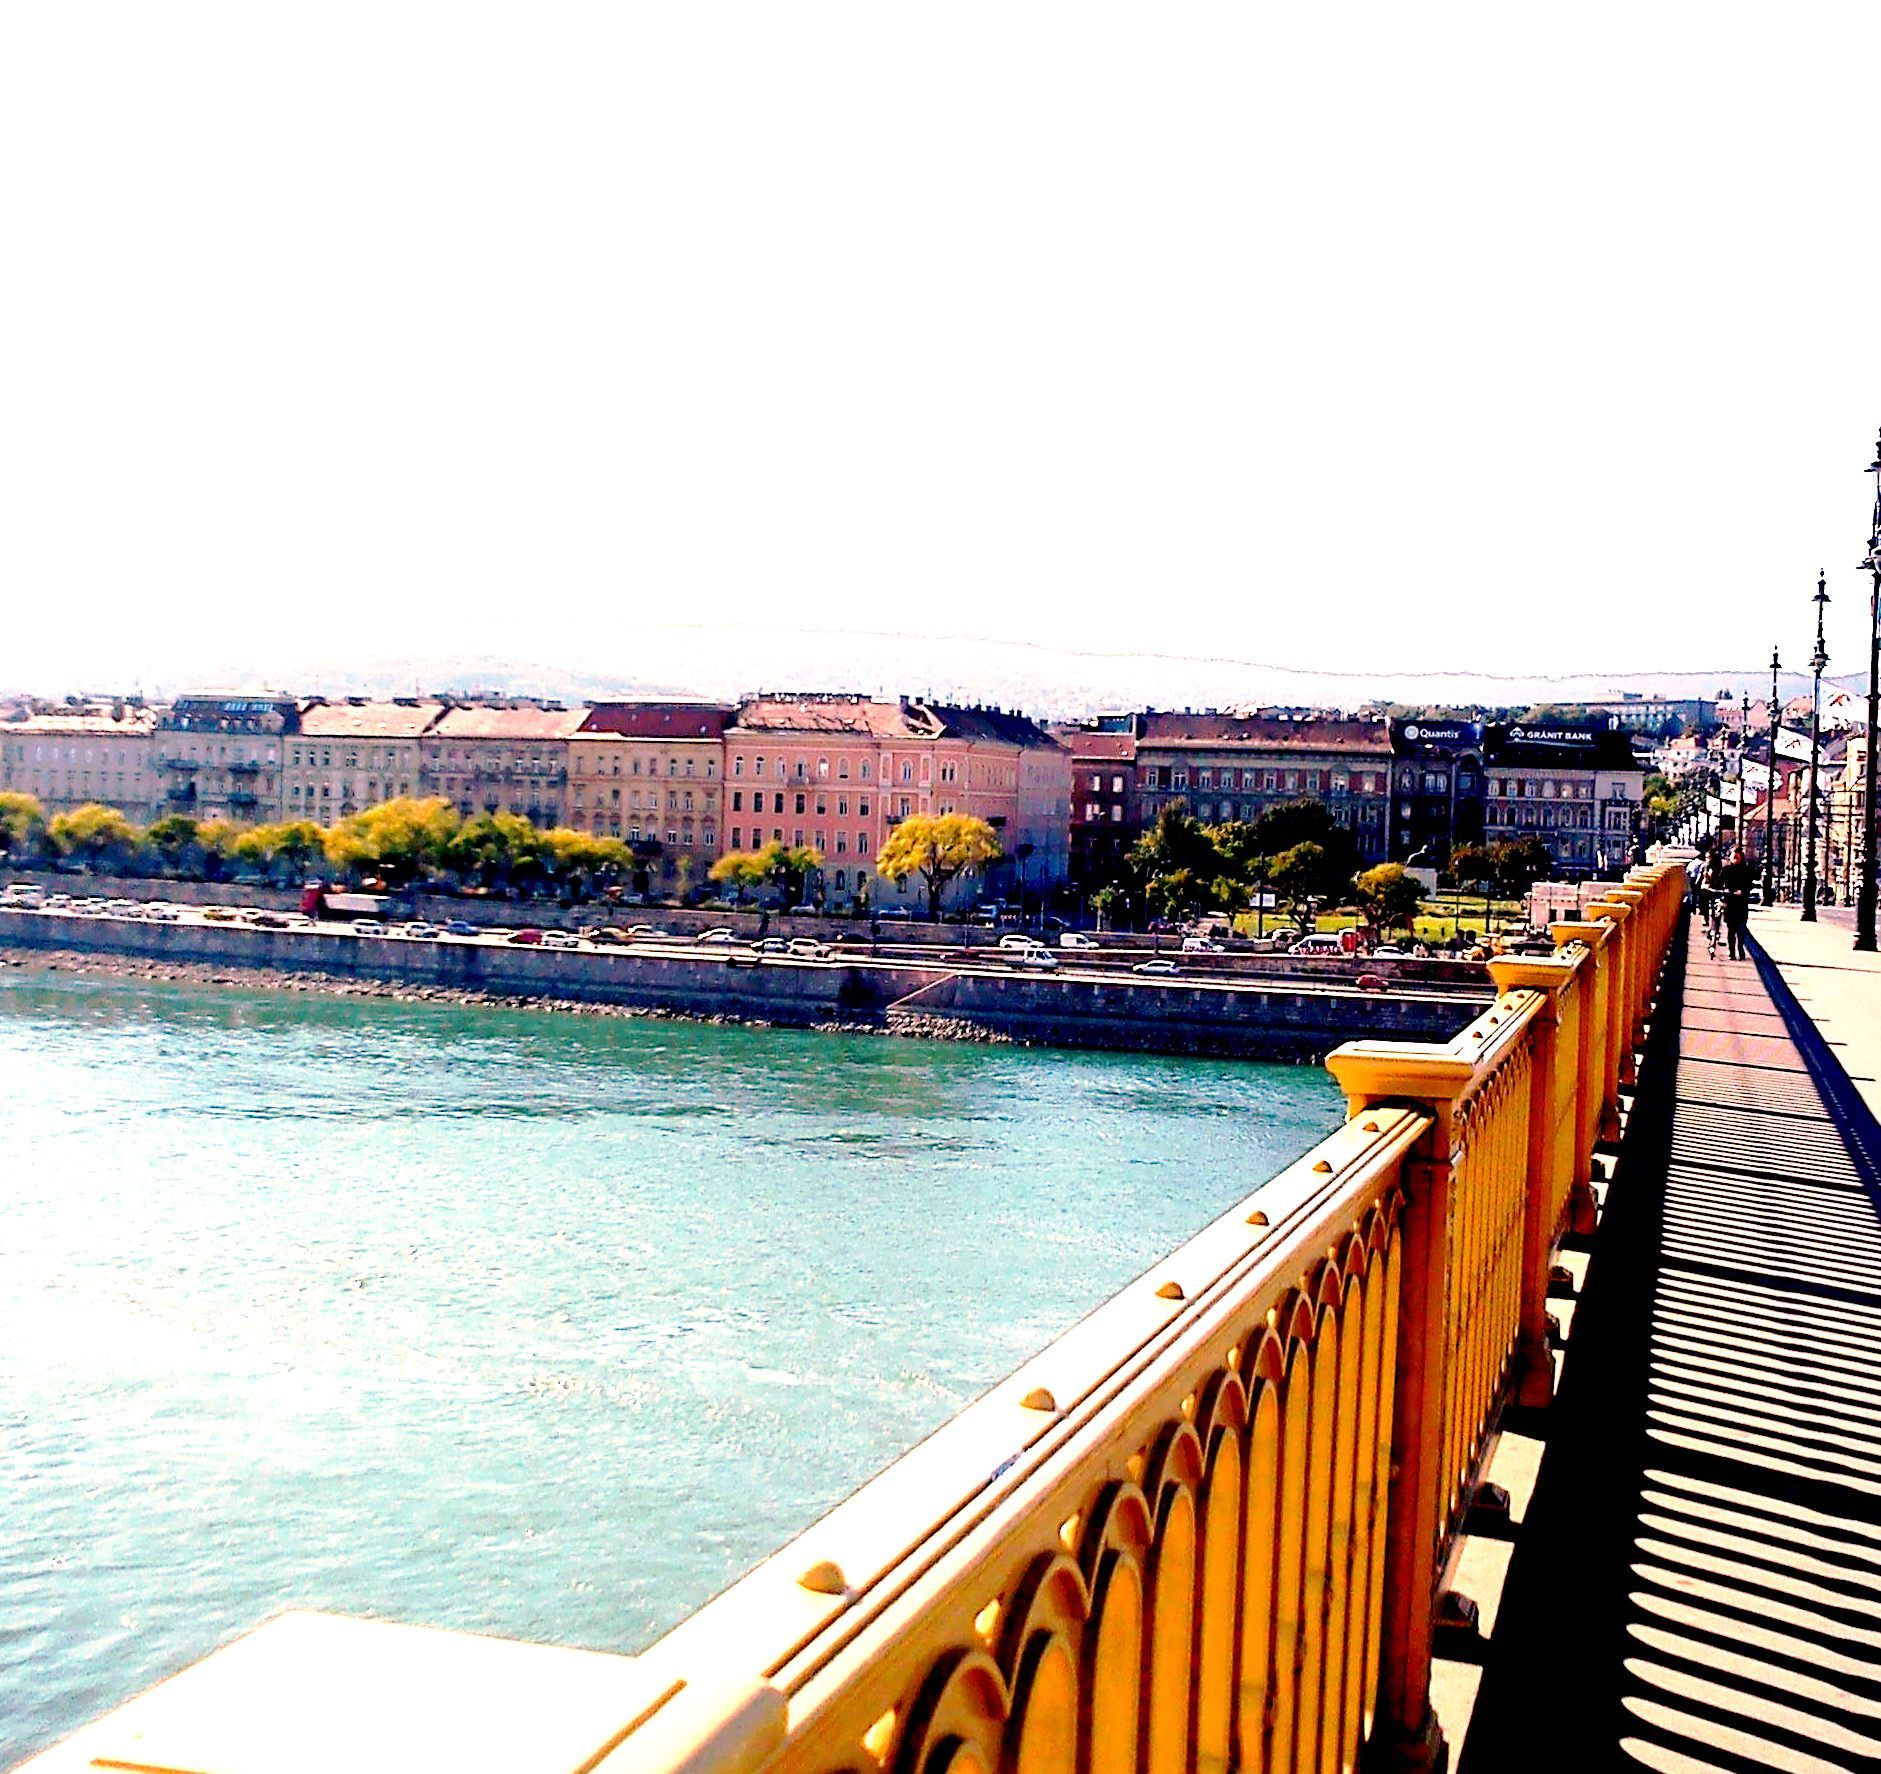 bRidge riVer_Budapest